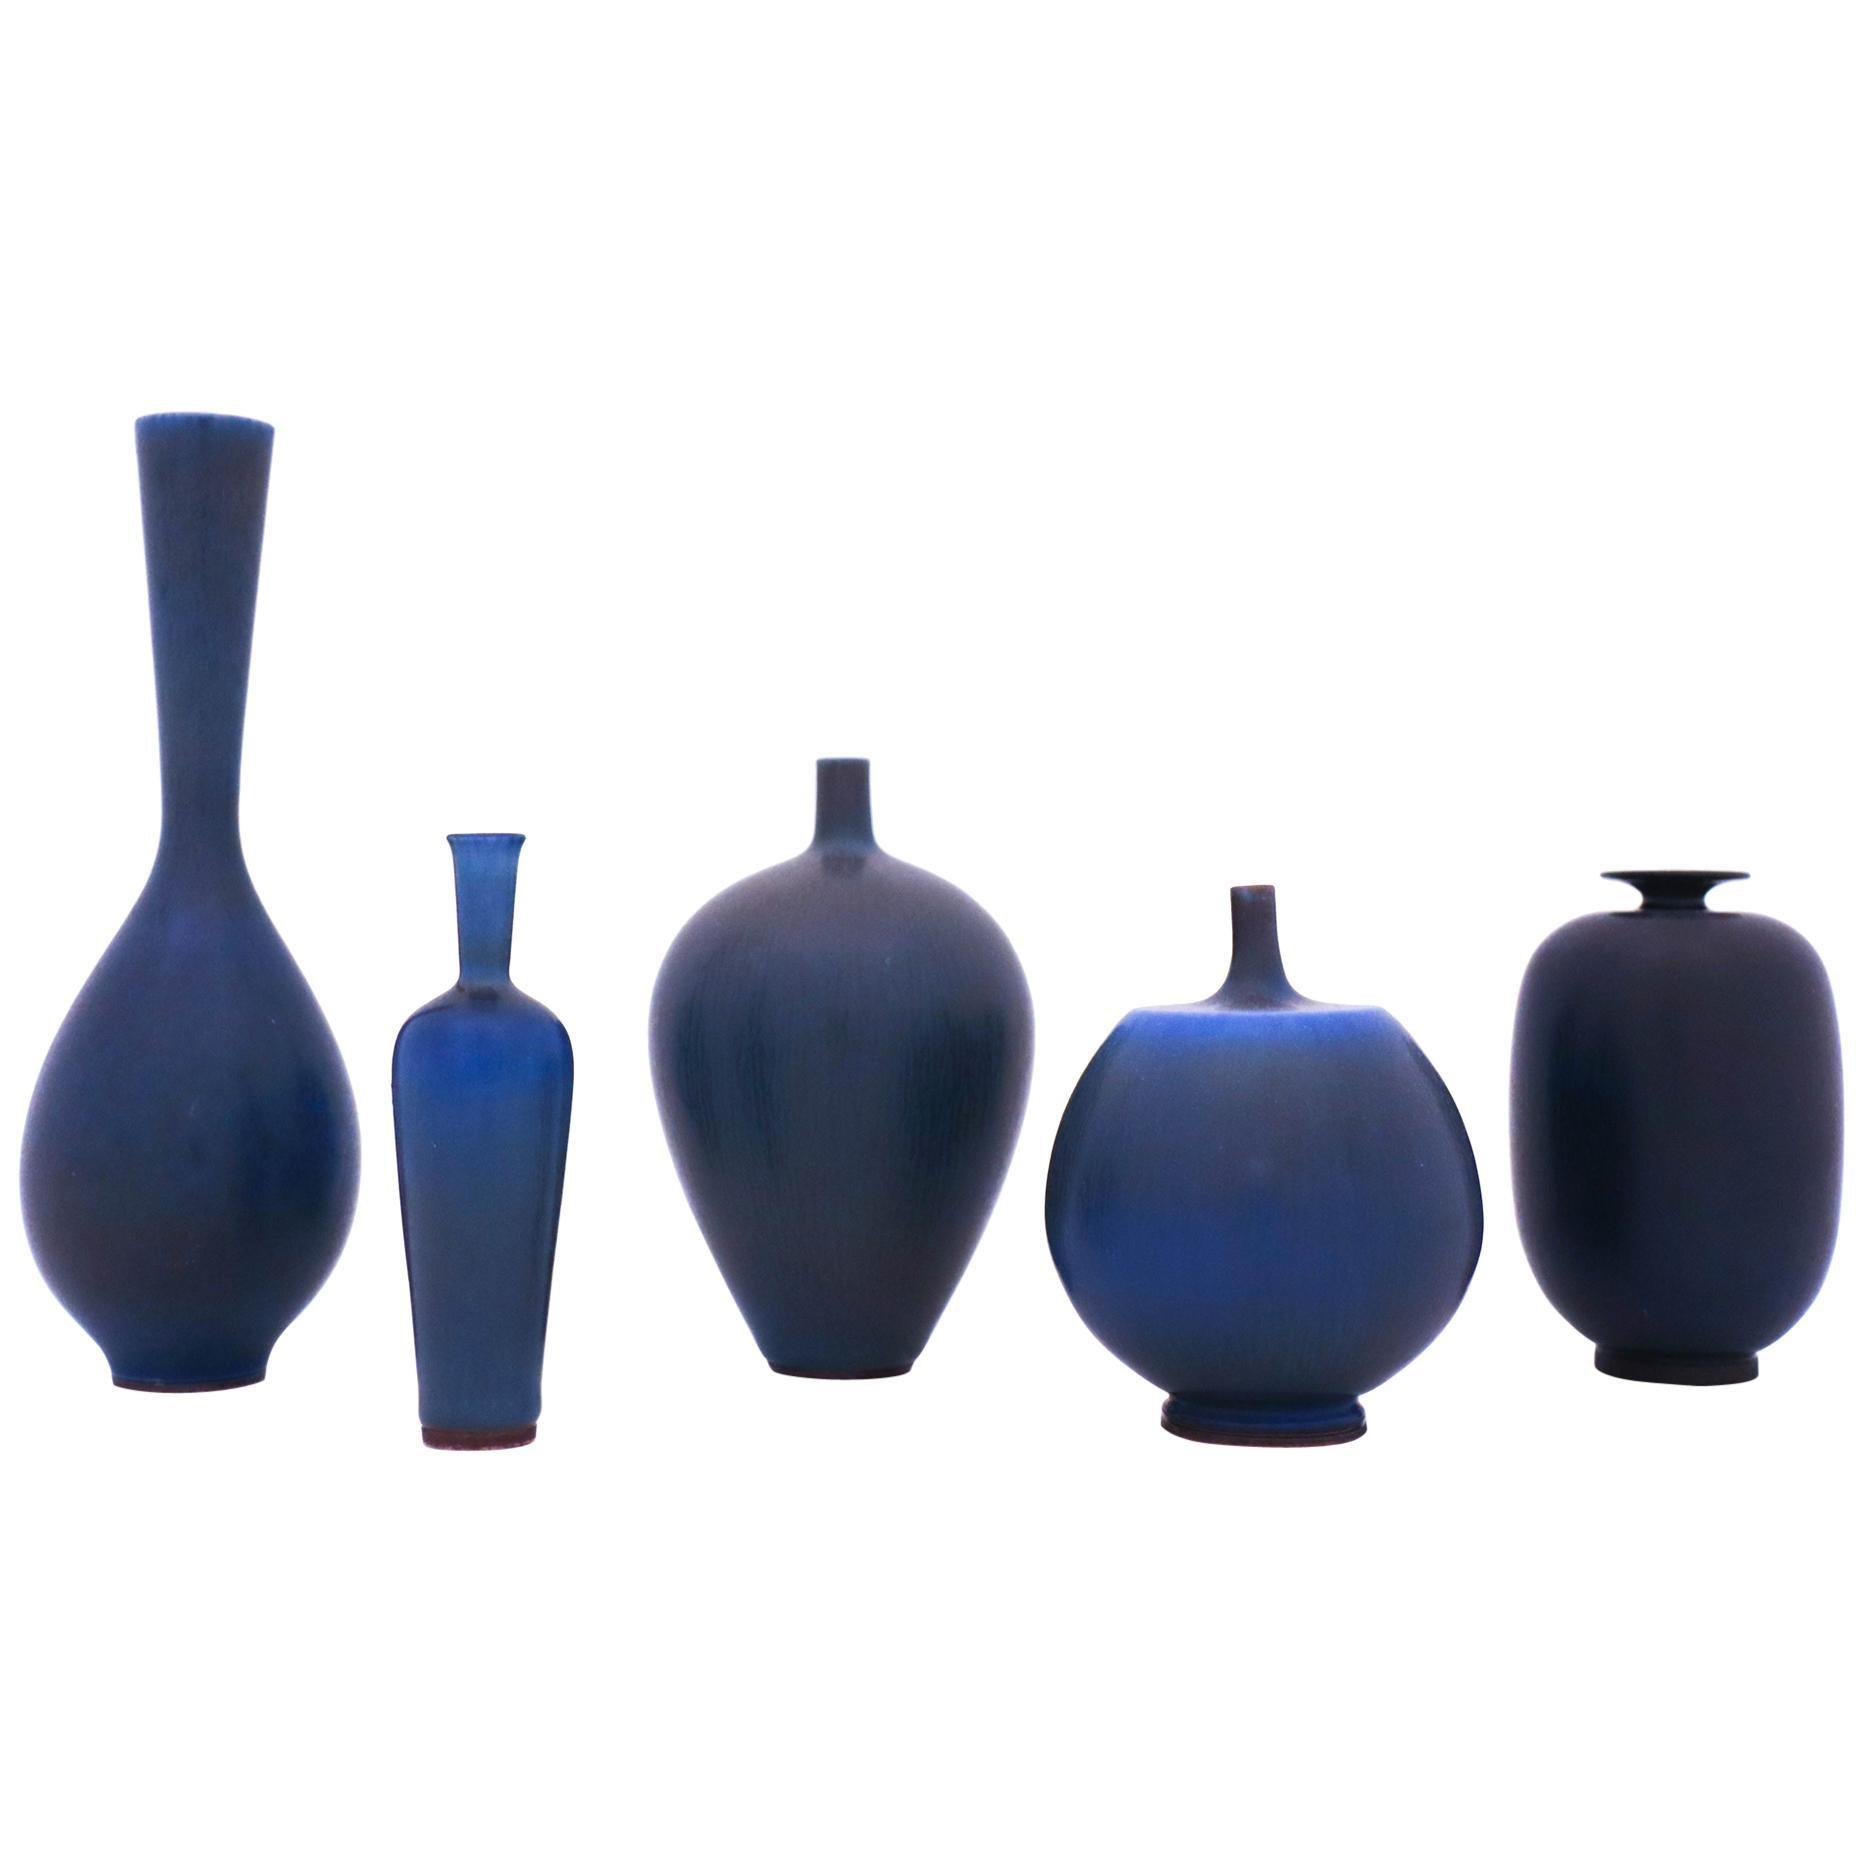 Group of 5 Blue Stoneware Vases, Berndt Friberg, Gustavsberg